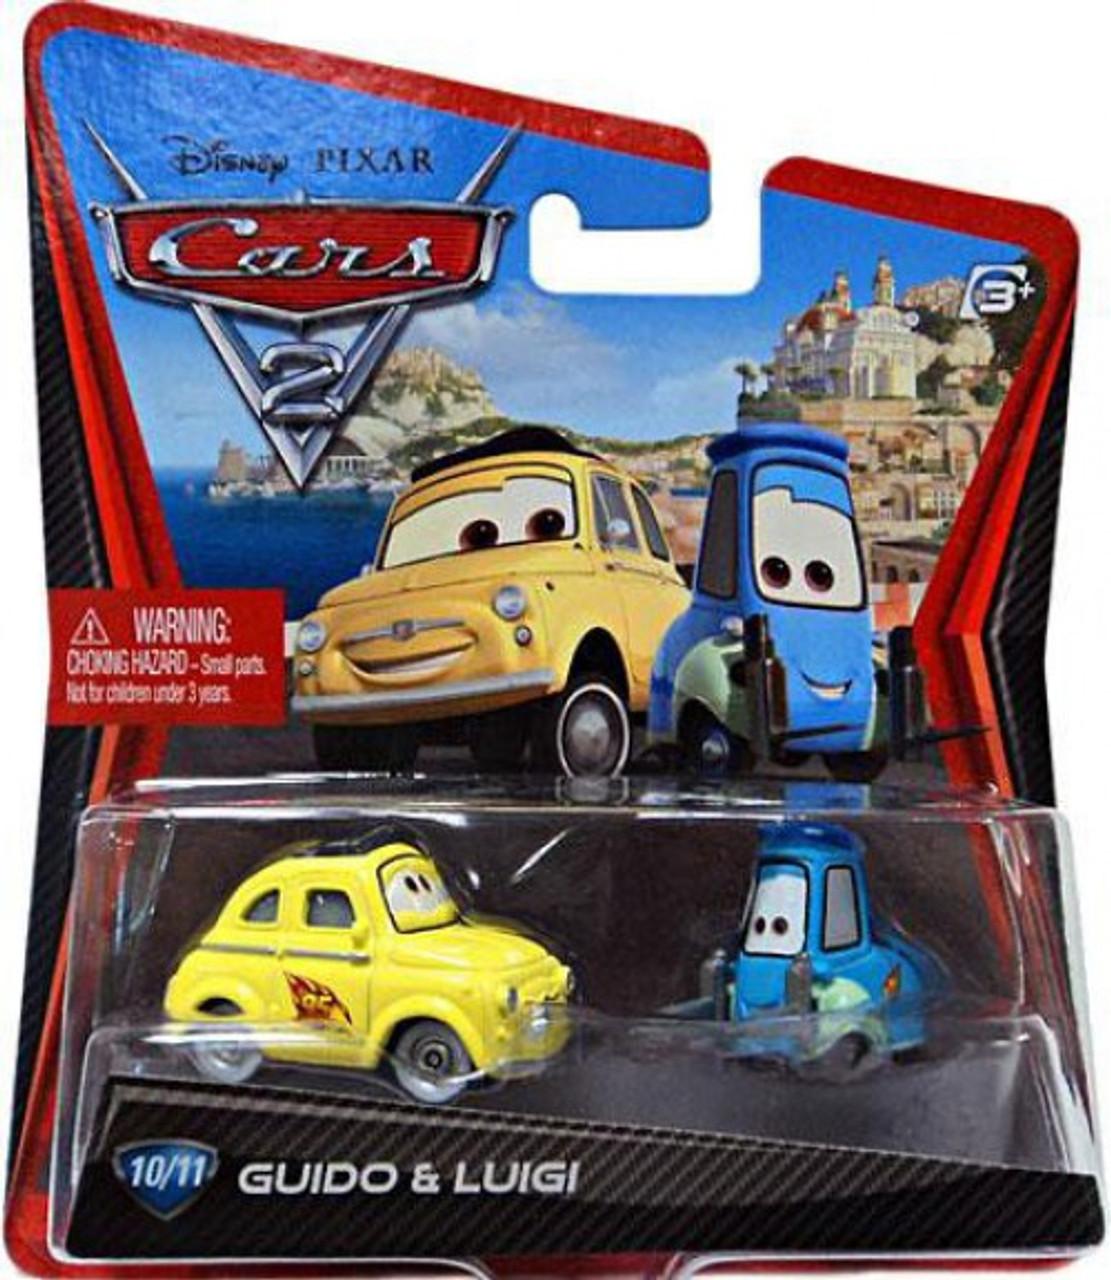 Disney Pixar Cars Cars 2 Main Series Guido Luigi 155 Diecast Car